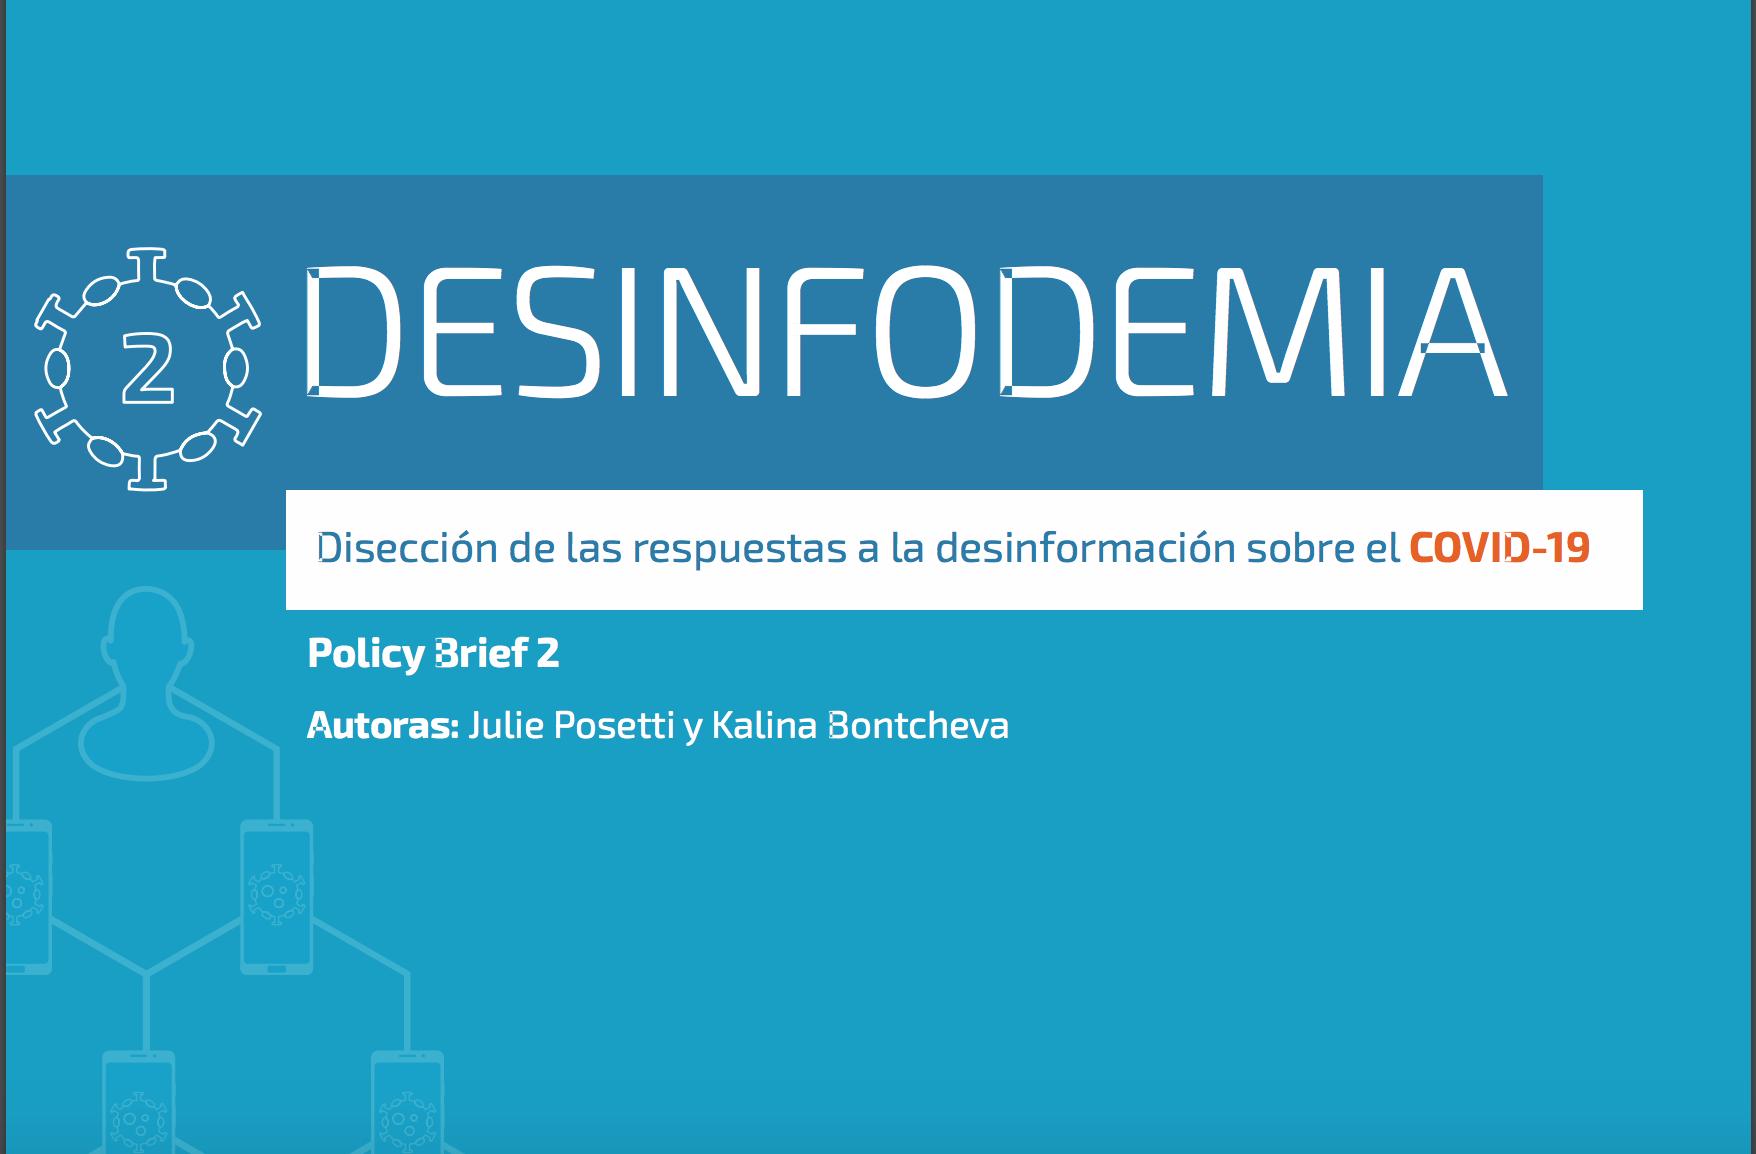 Desinfodemia COVID 19